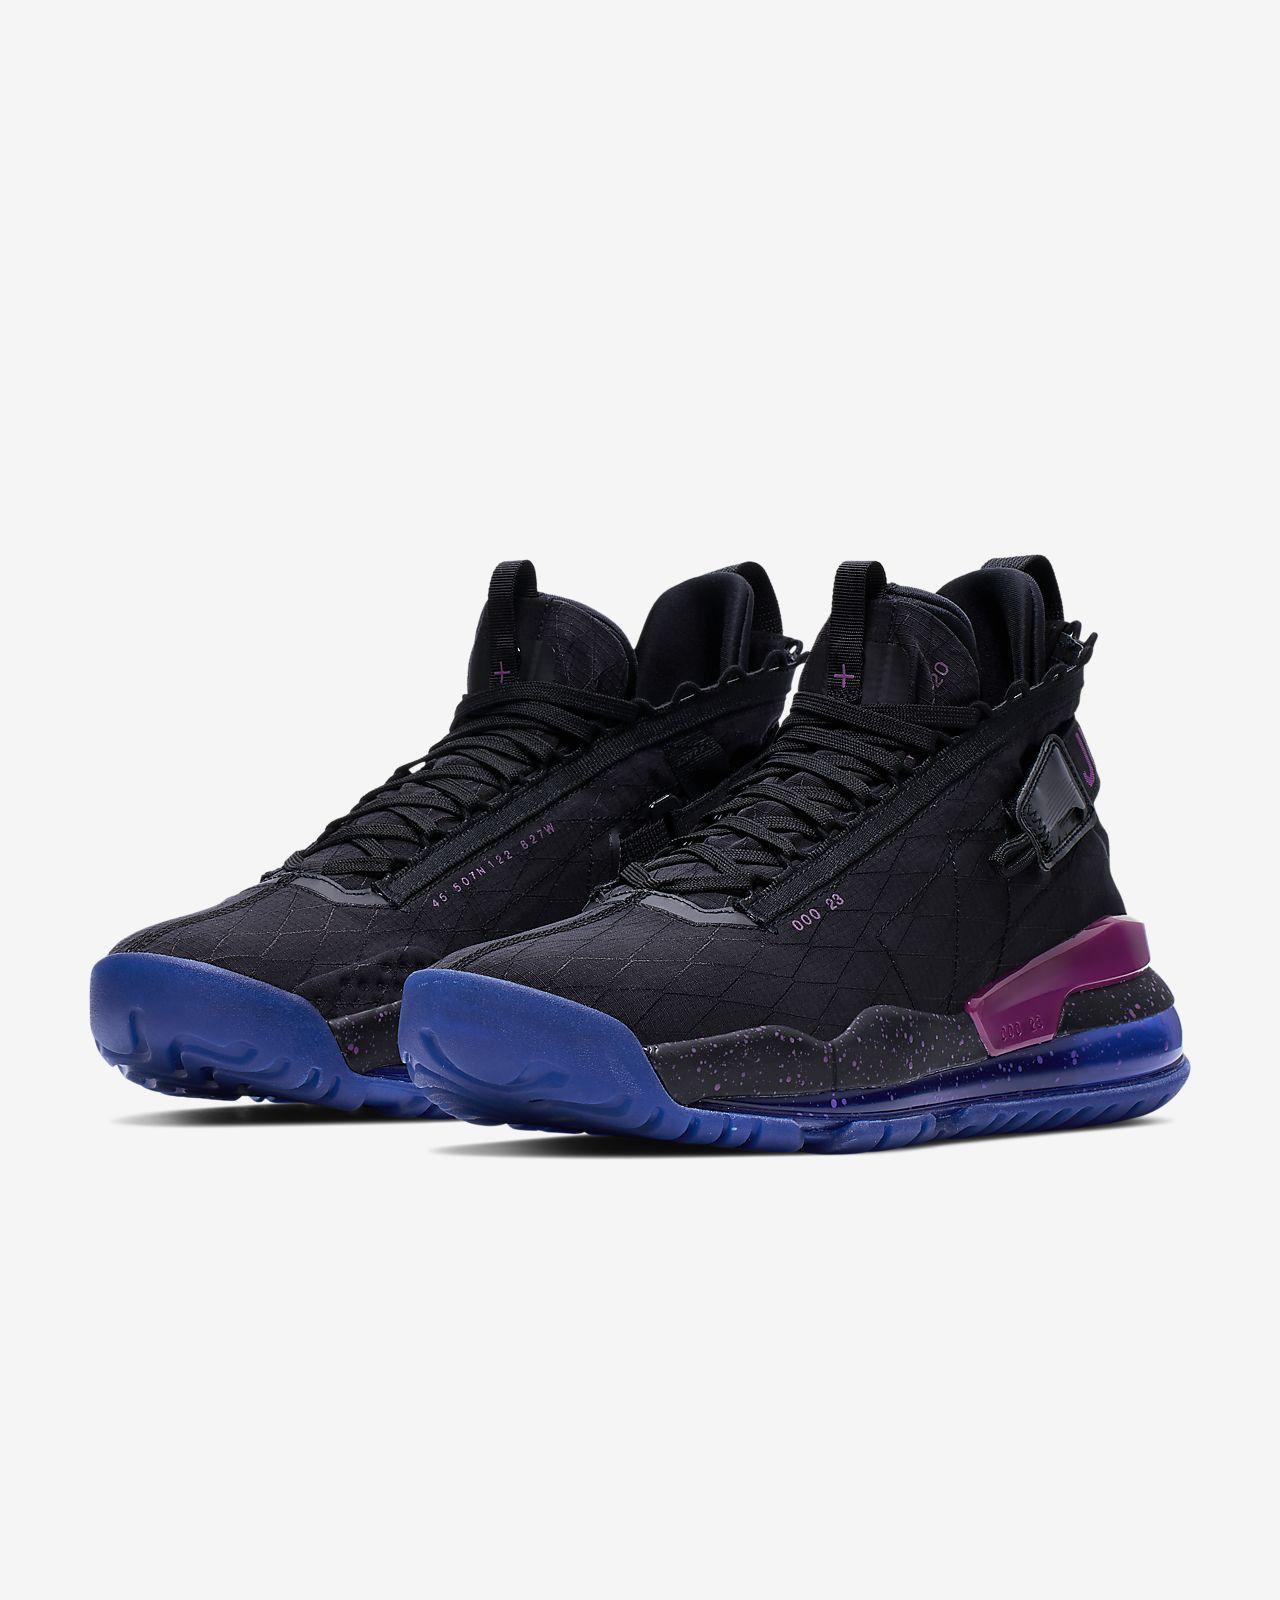 Jordan Proto Max 720 Men's Shoe